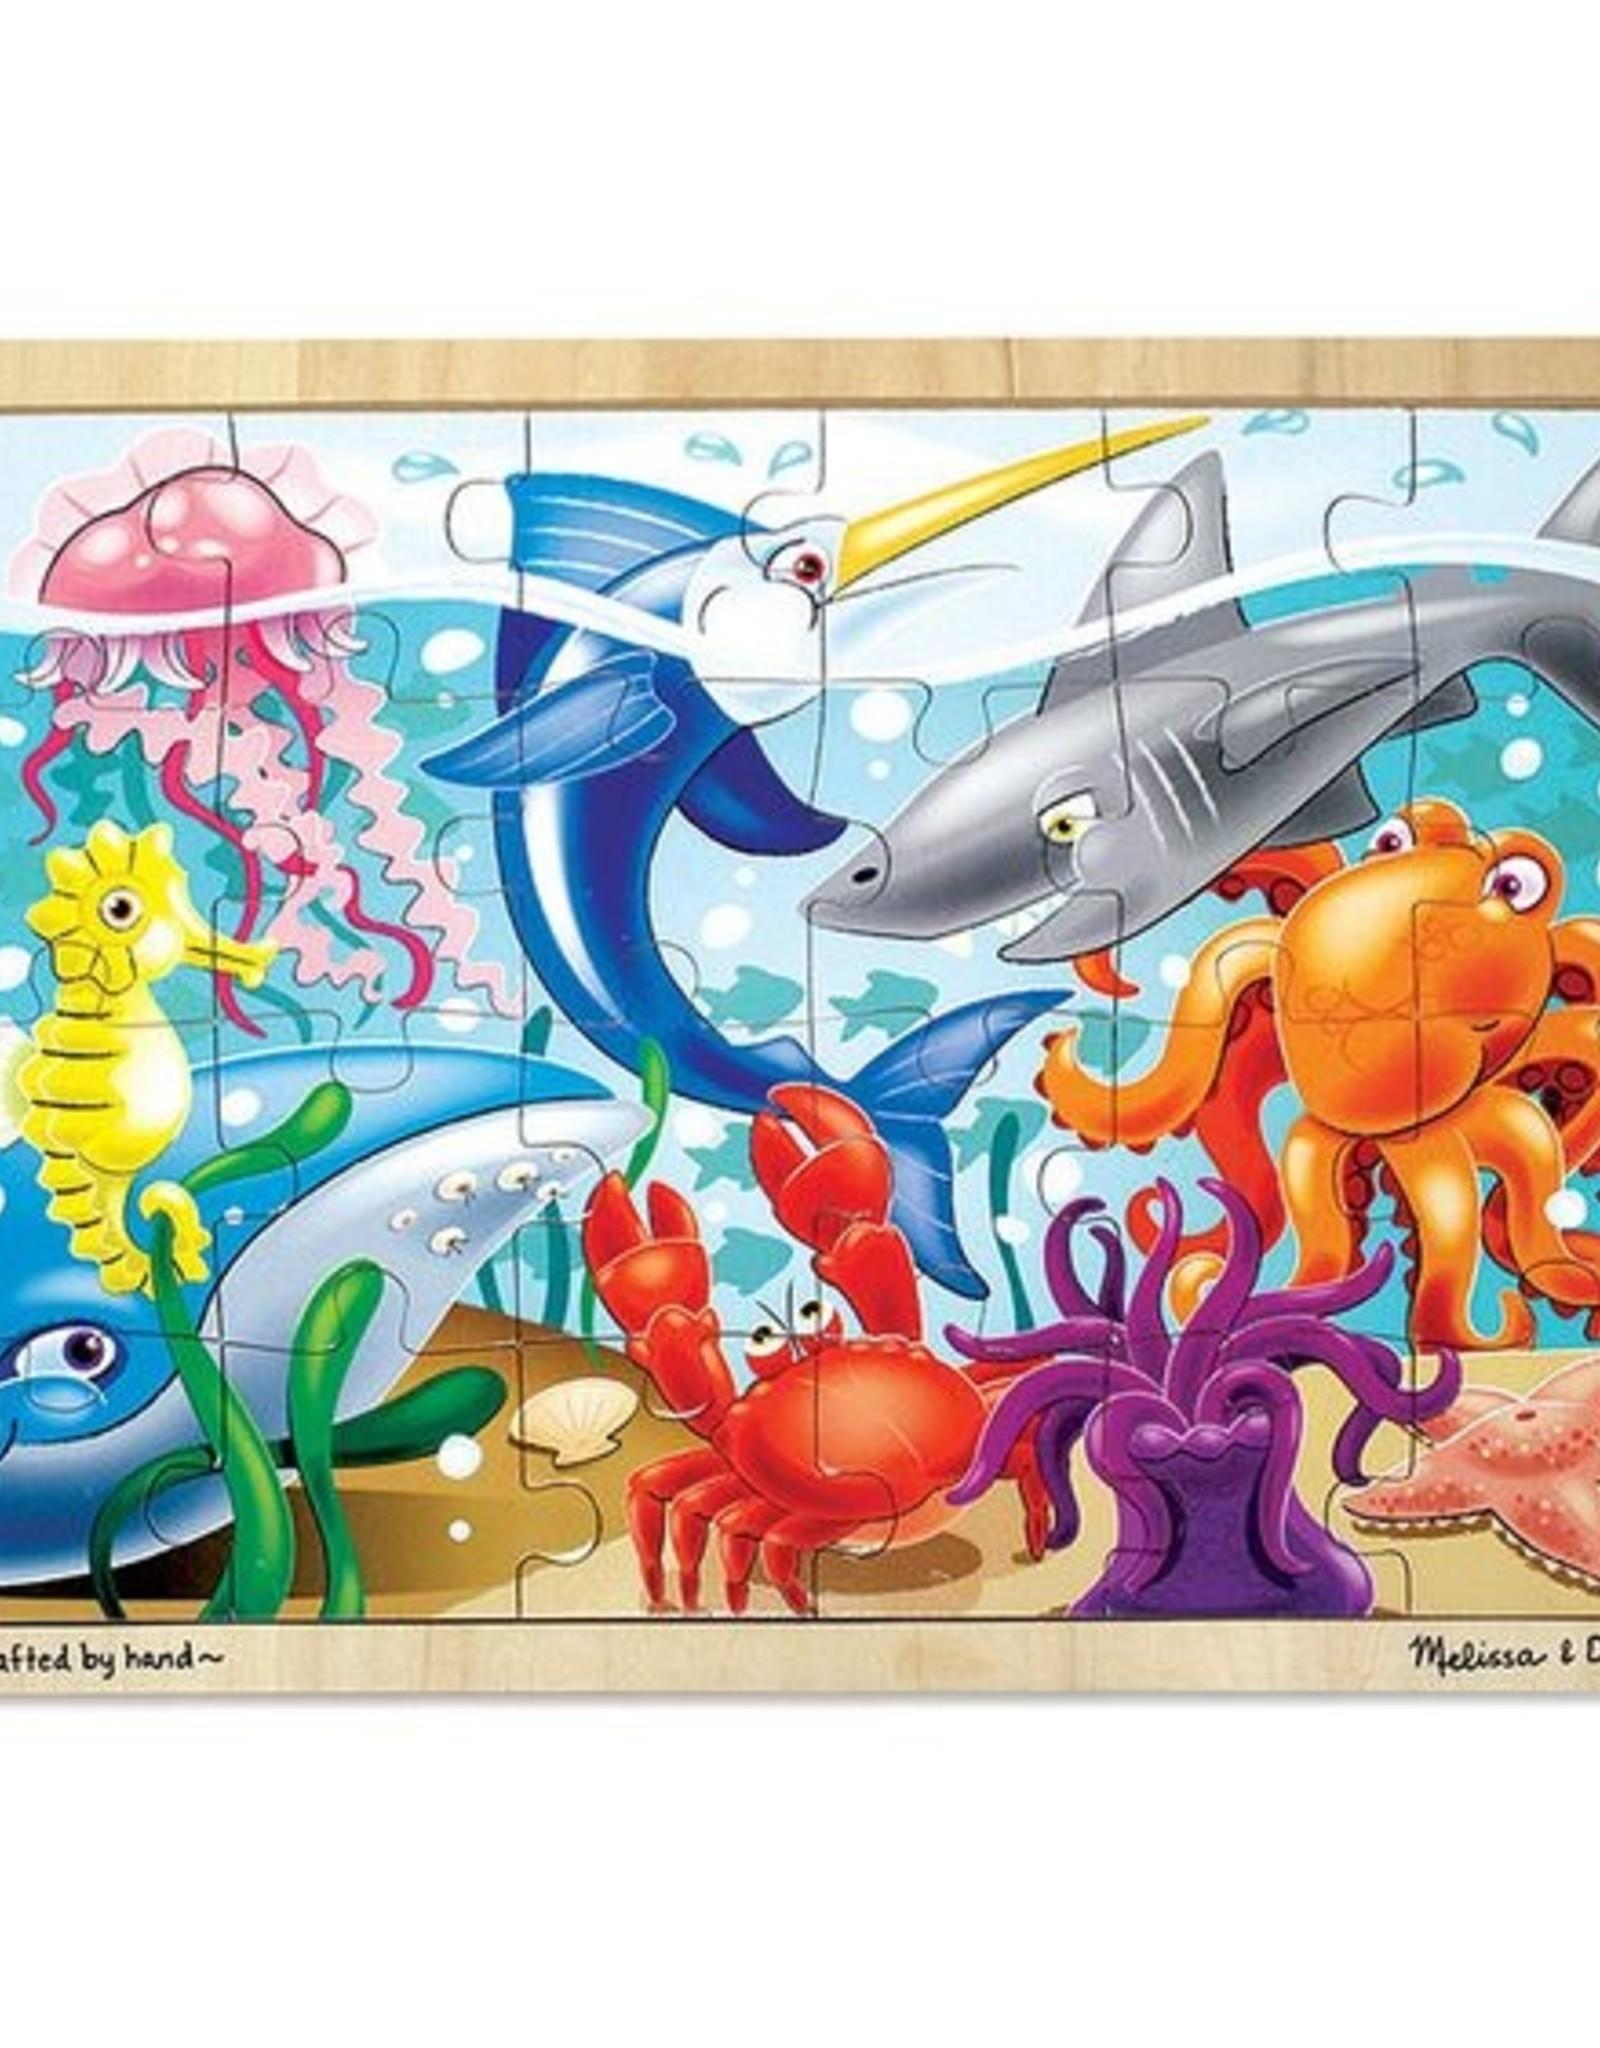 Melissa & Doug Under the Sea Jigsaw (24pcs)